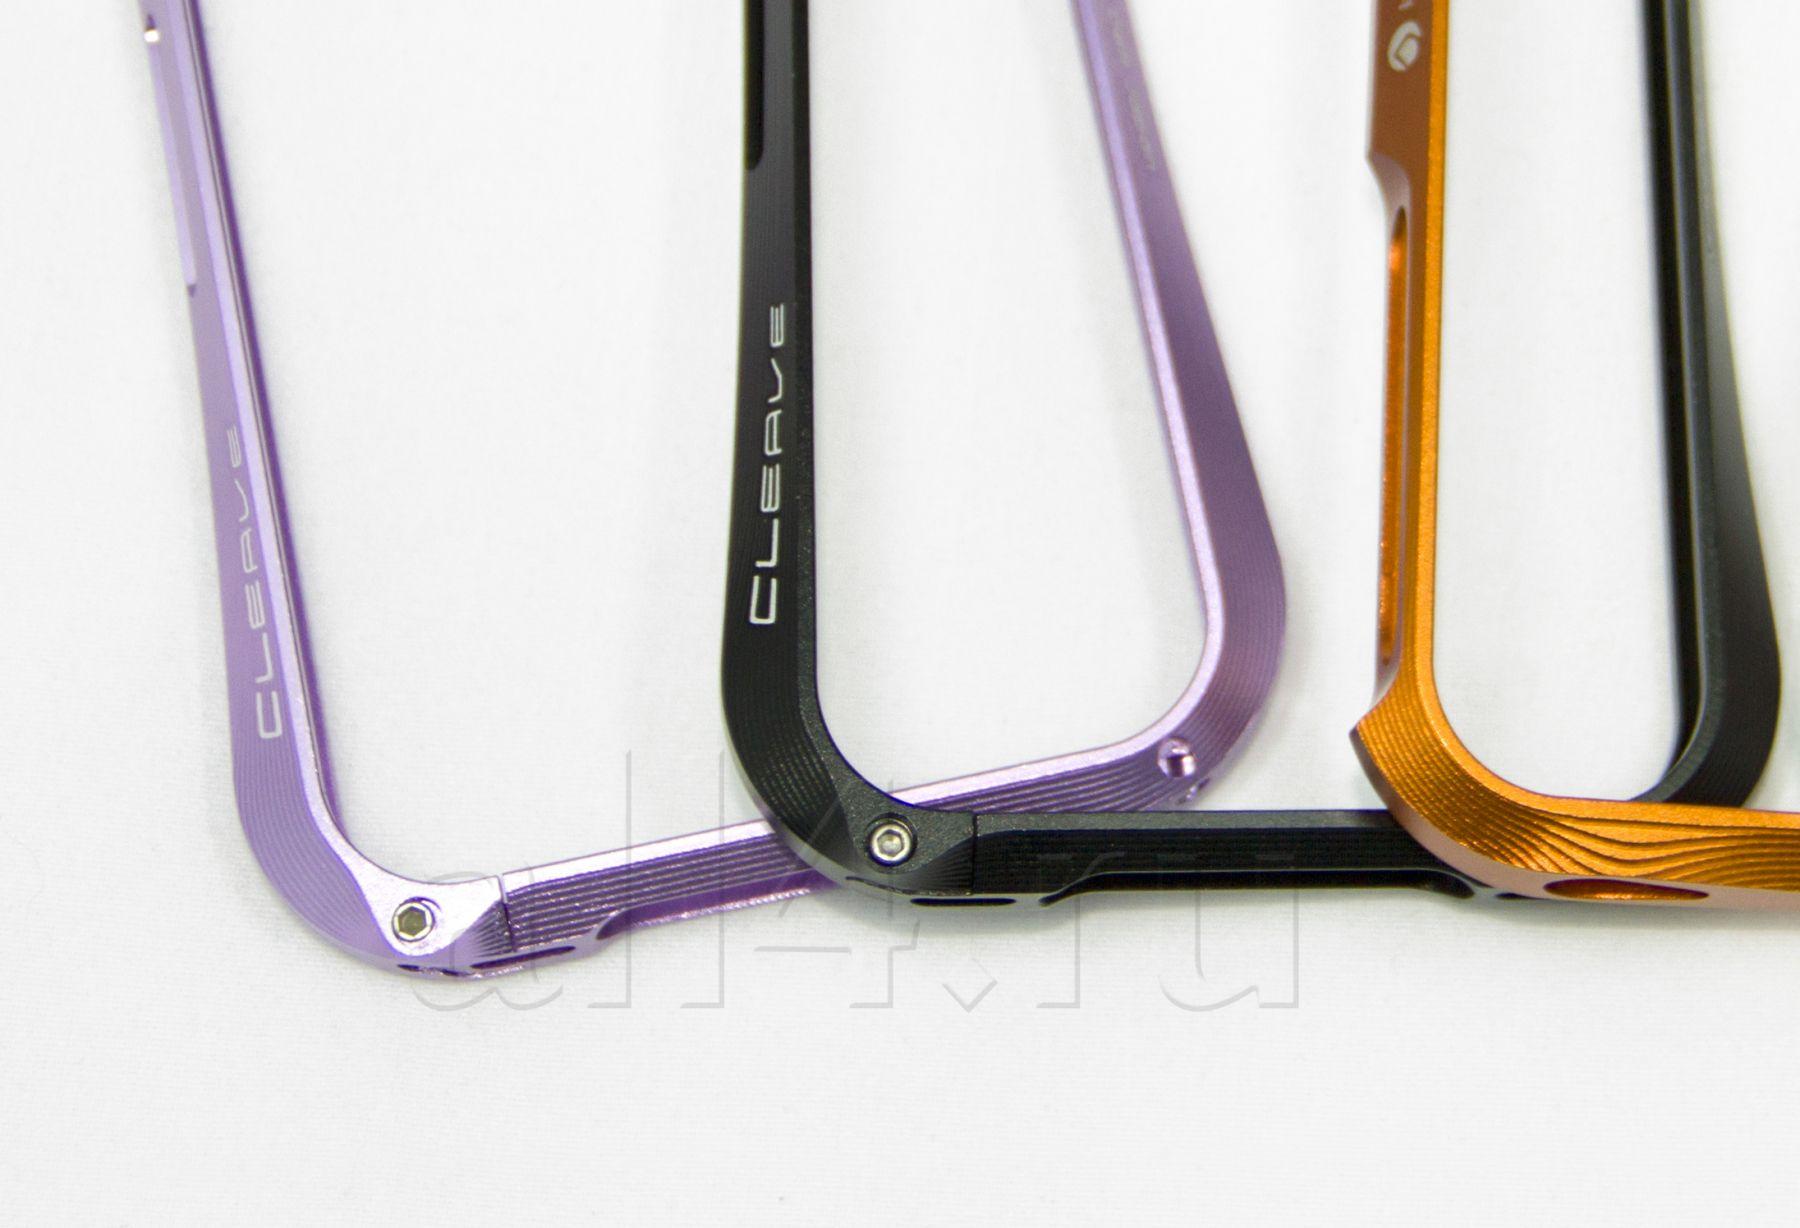 Бампер металлический CLEAVE  для iPhone 4/4S фиолетовый